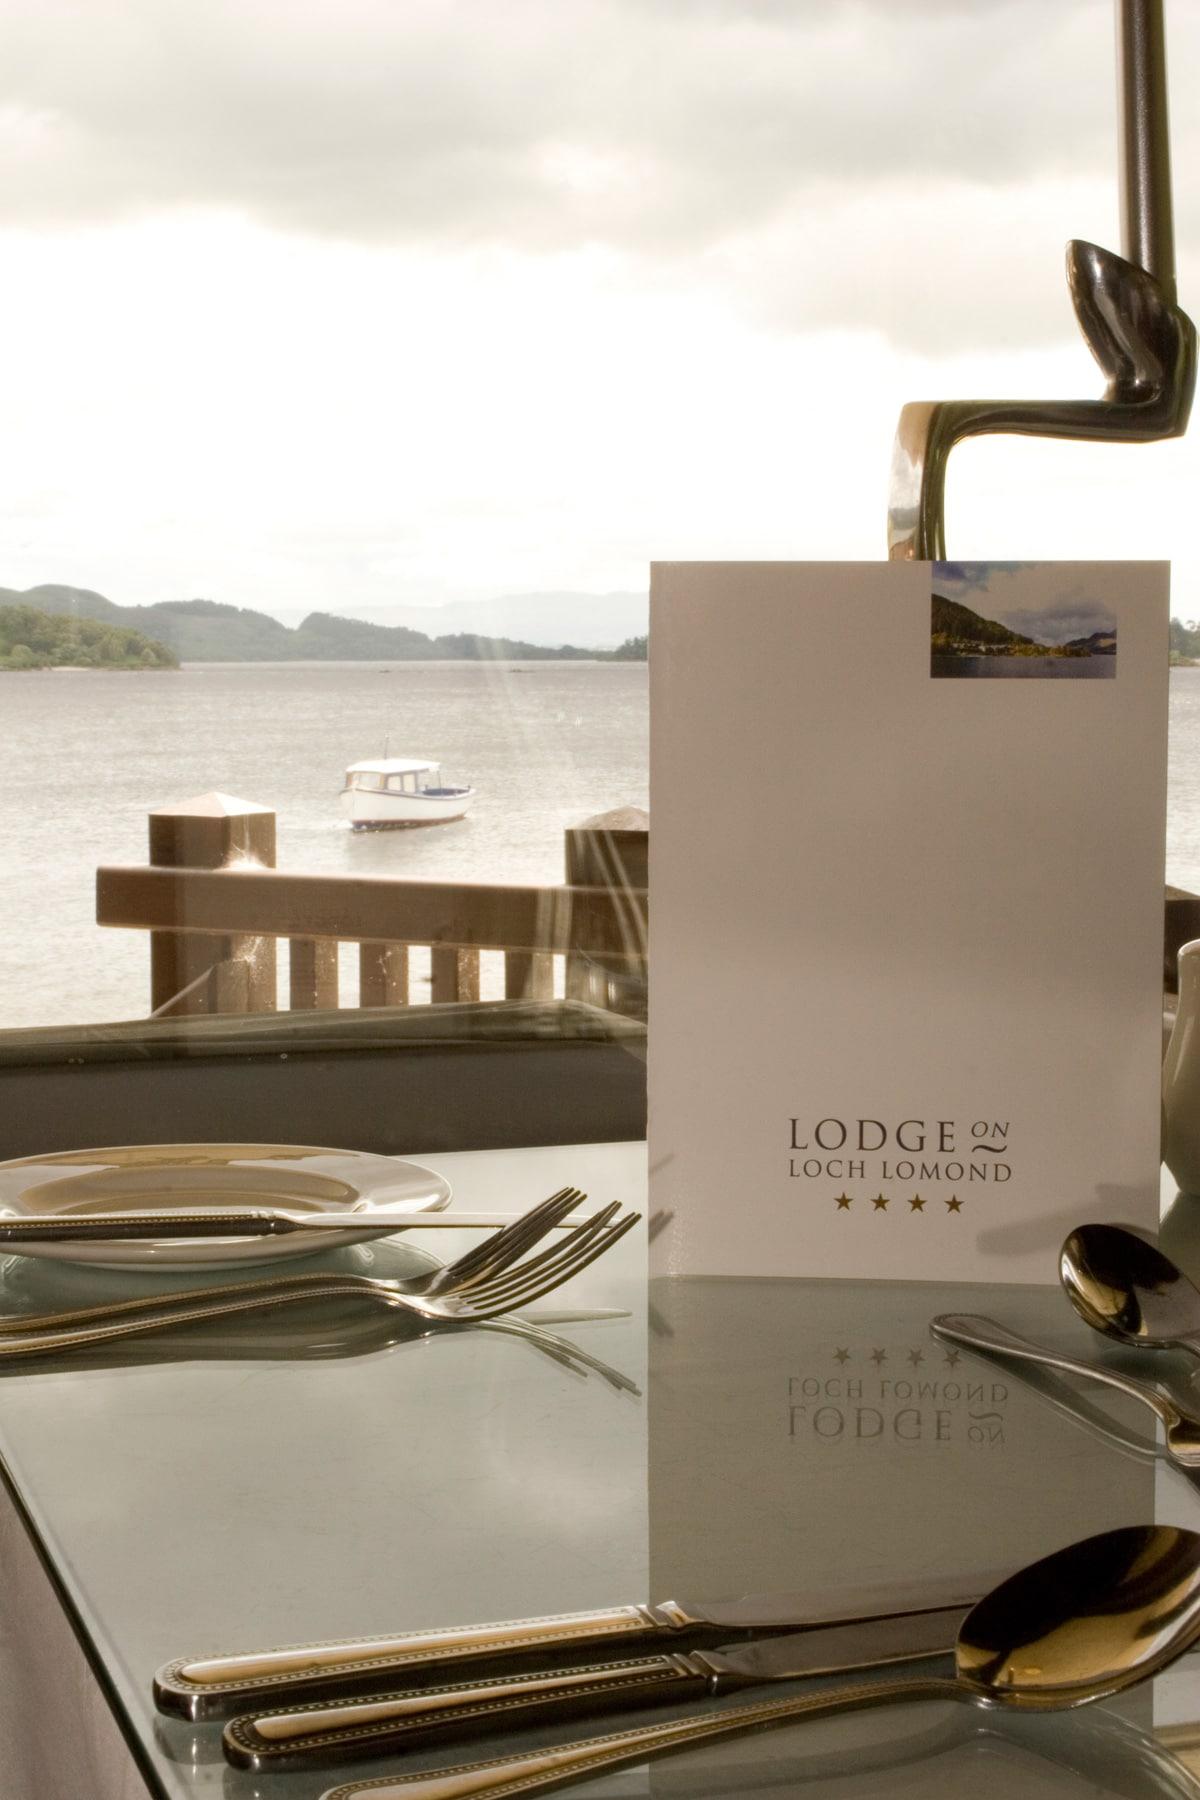 Lodge on Loch Lomond Restauarnt View over Loch Lomond